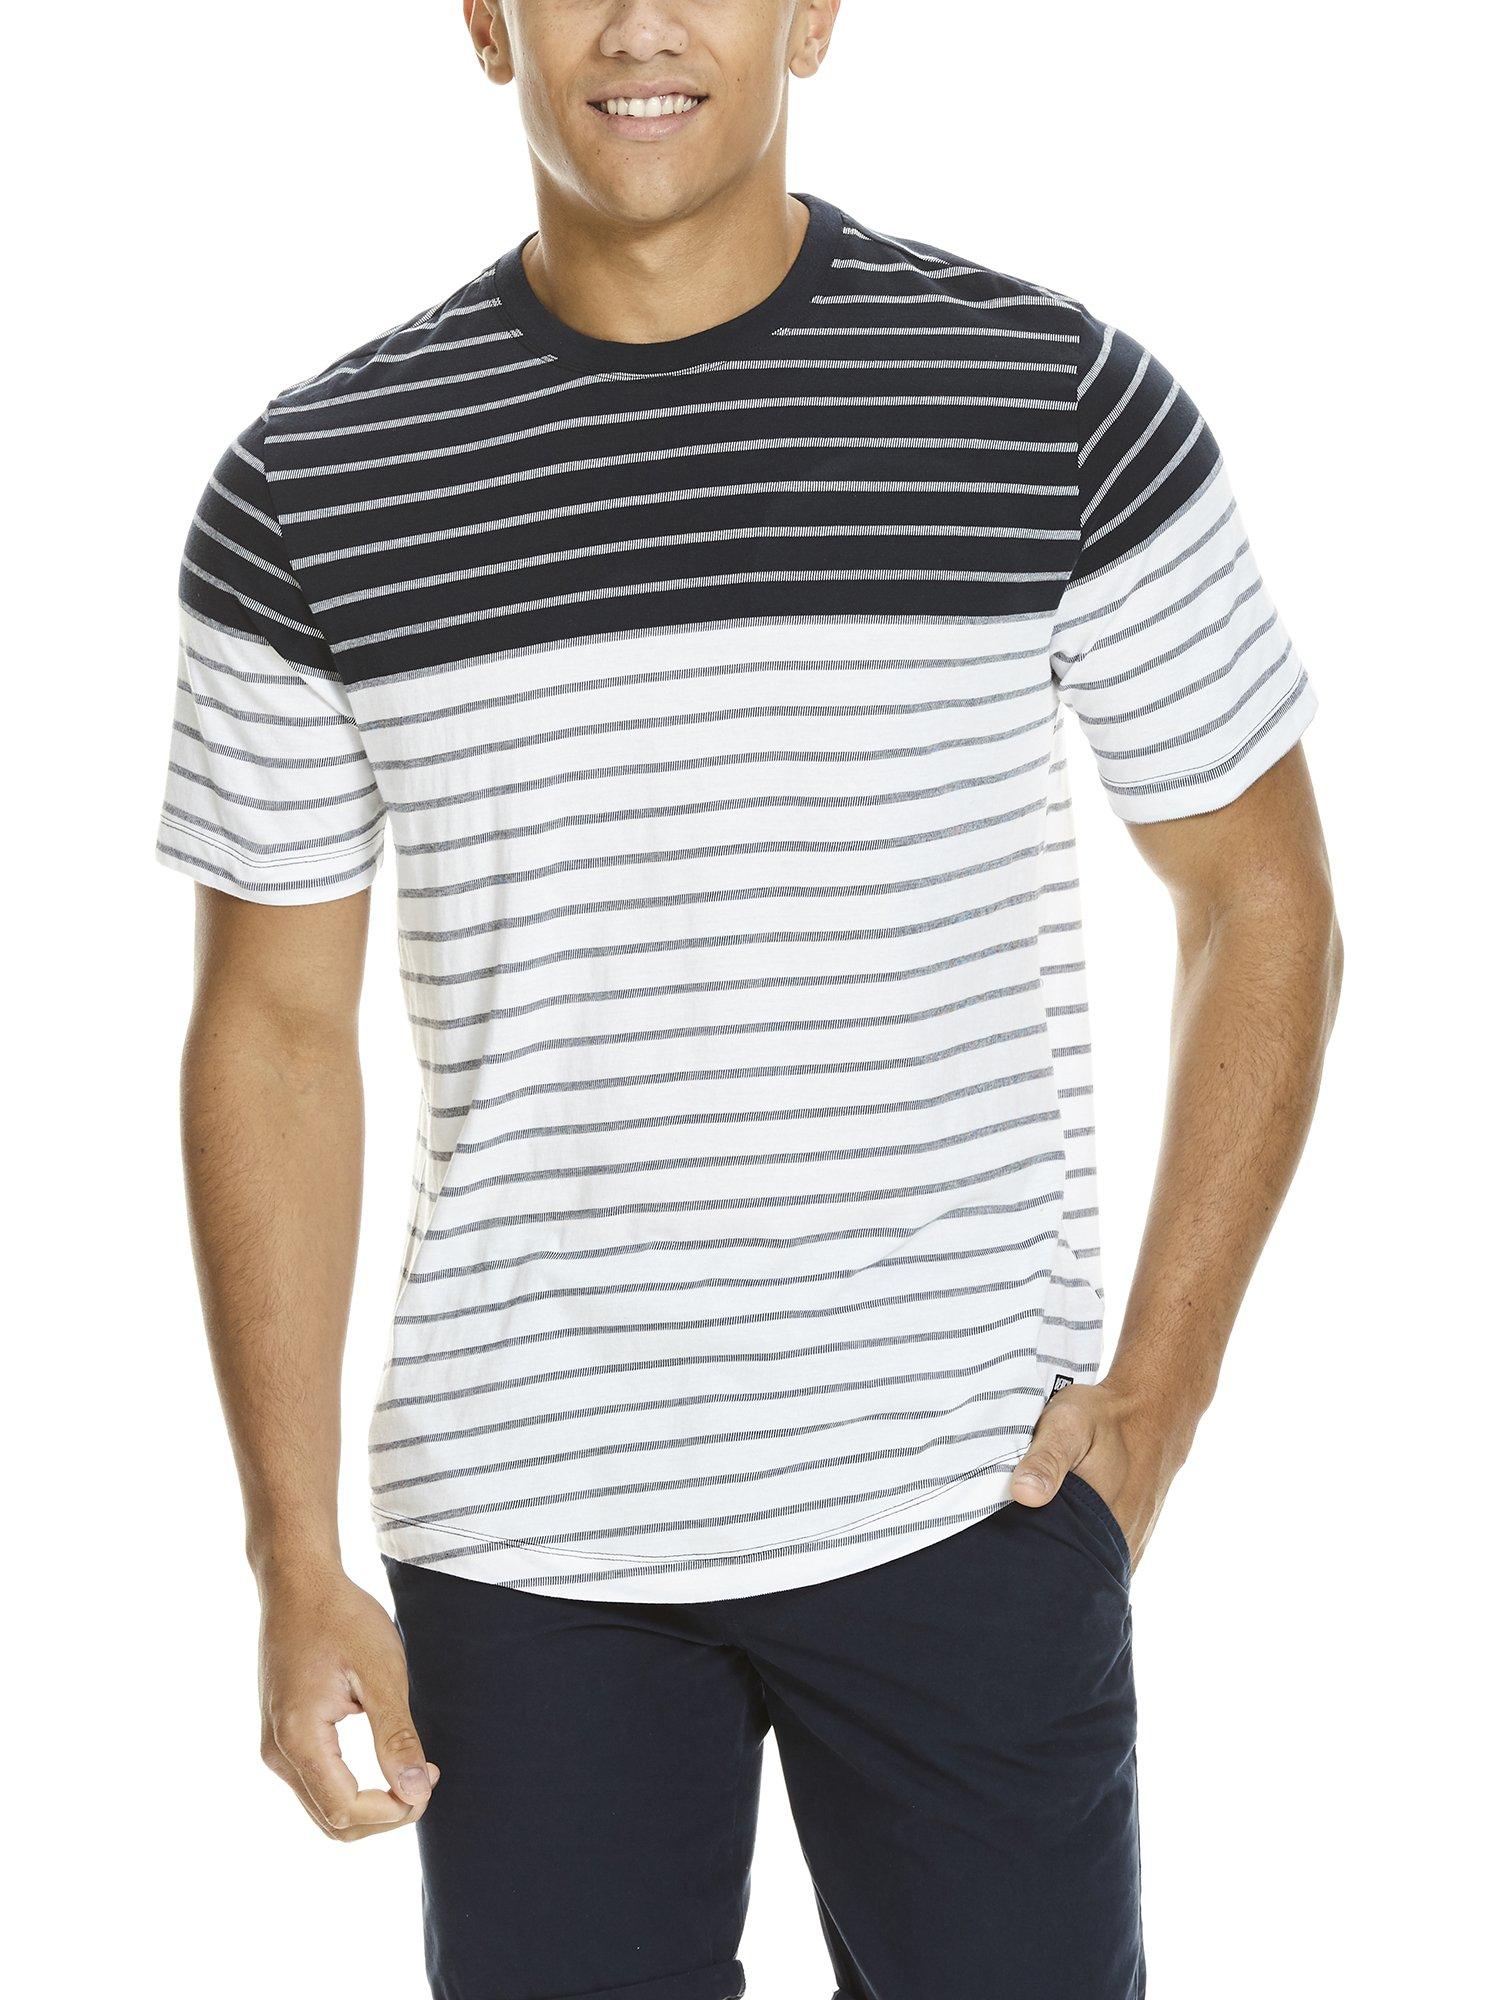 Bench Stripe T-Shirt - Blmg000154